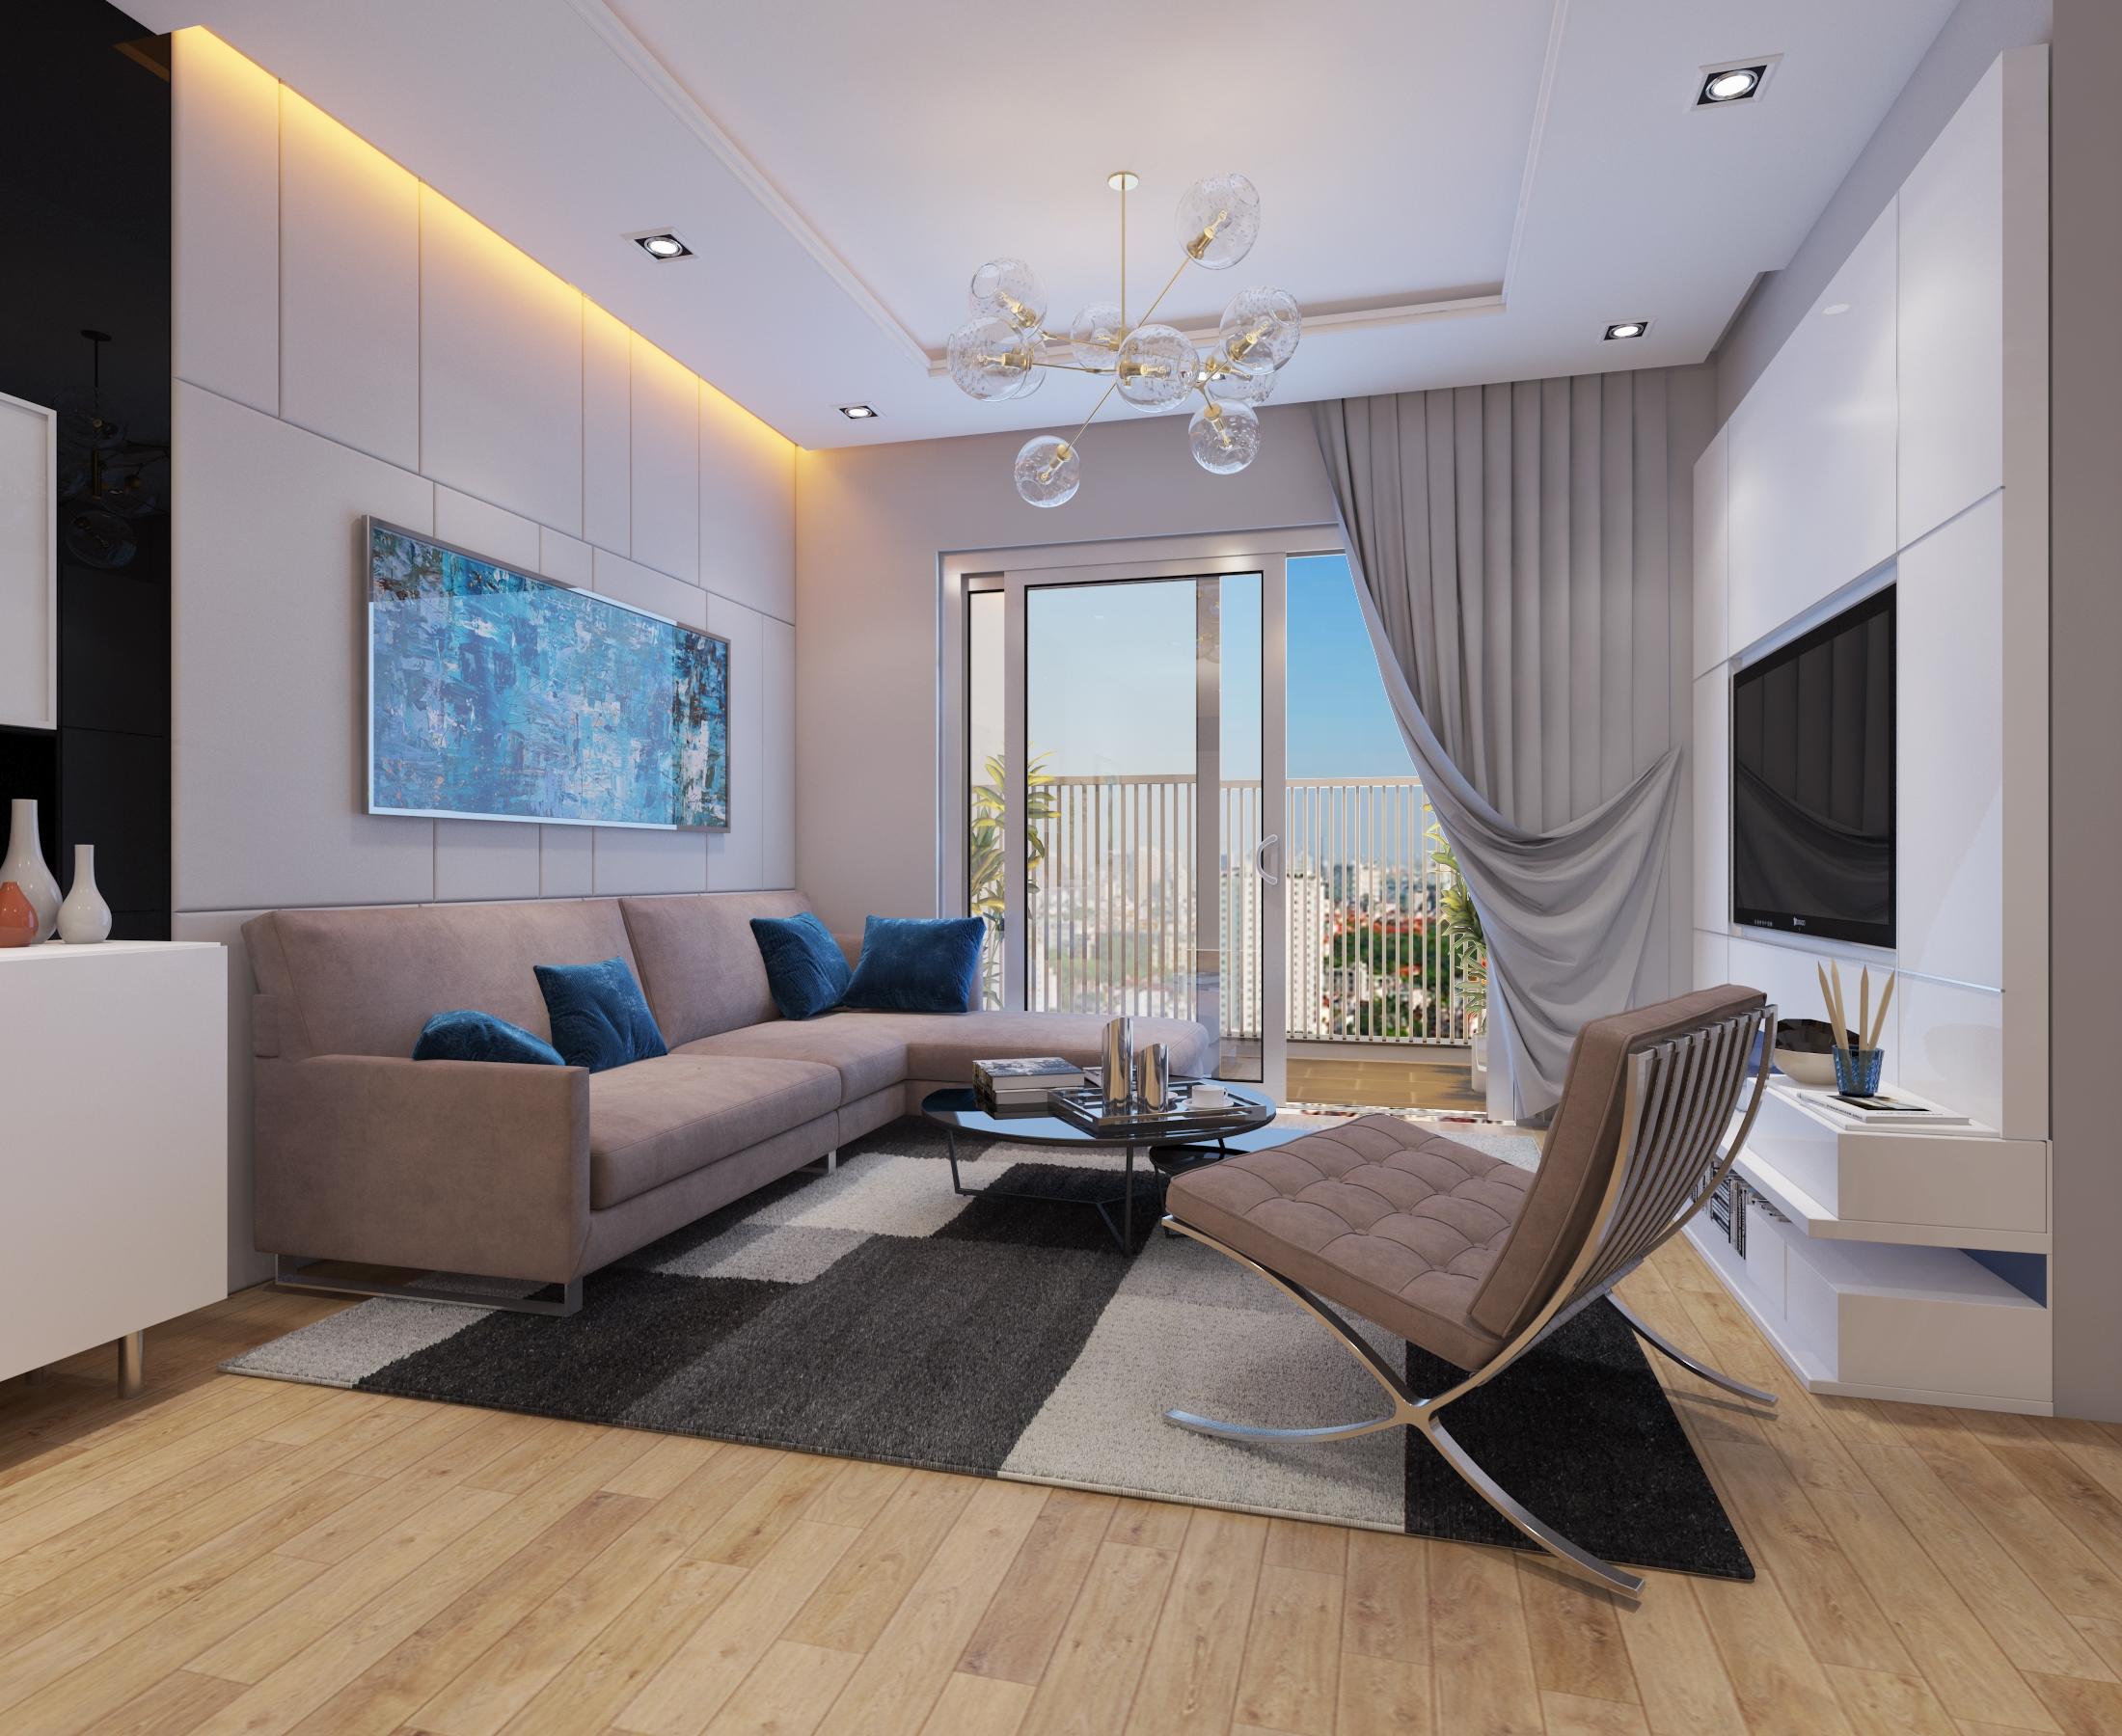 Cutaway Apartment Full Furnitures Modern Design: Cutaway Apartment Full Furnitures In Modern Design 3D Model